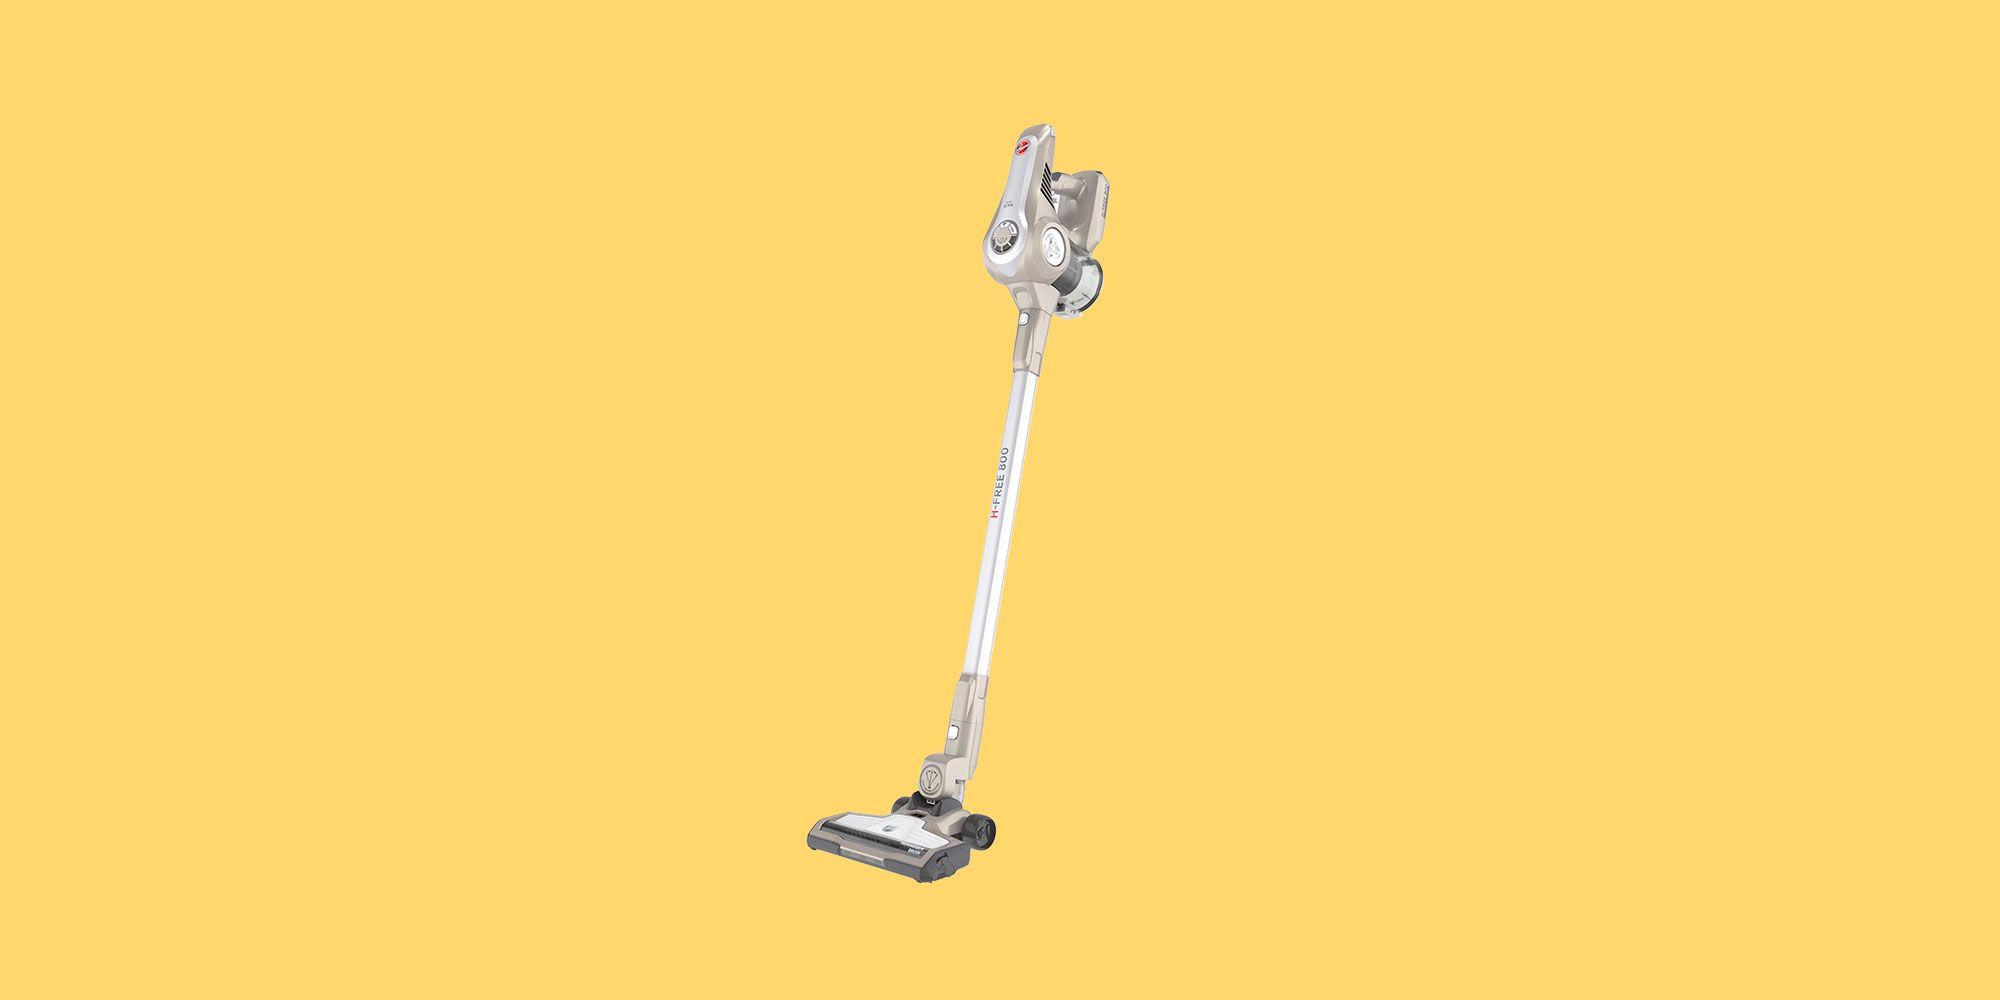 Hoover H Free 800 Cordless Vacuum